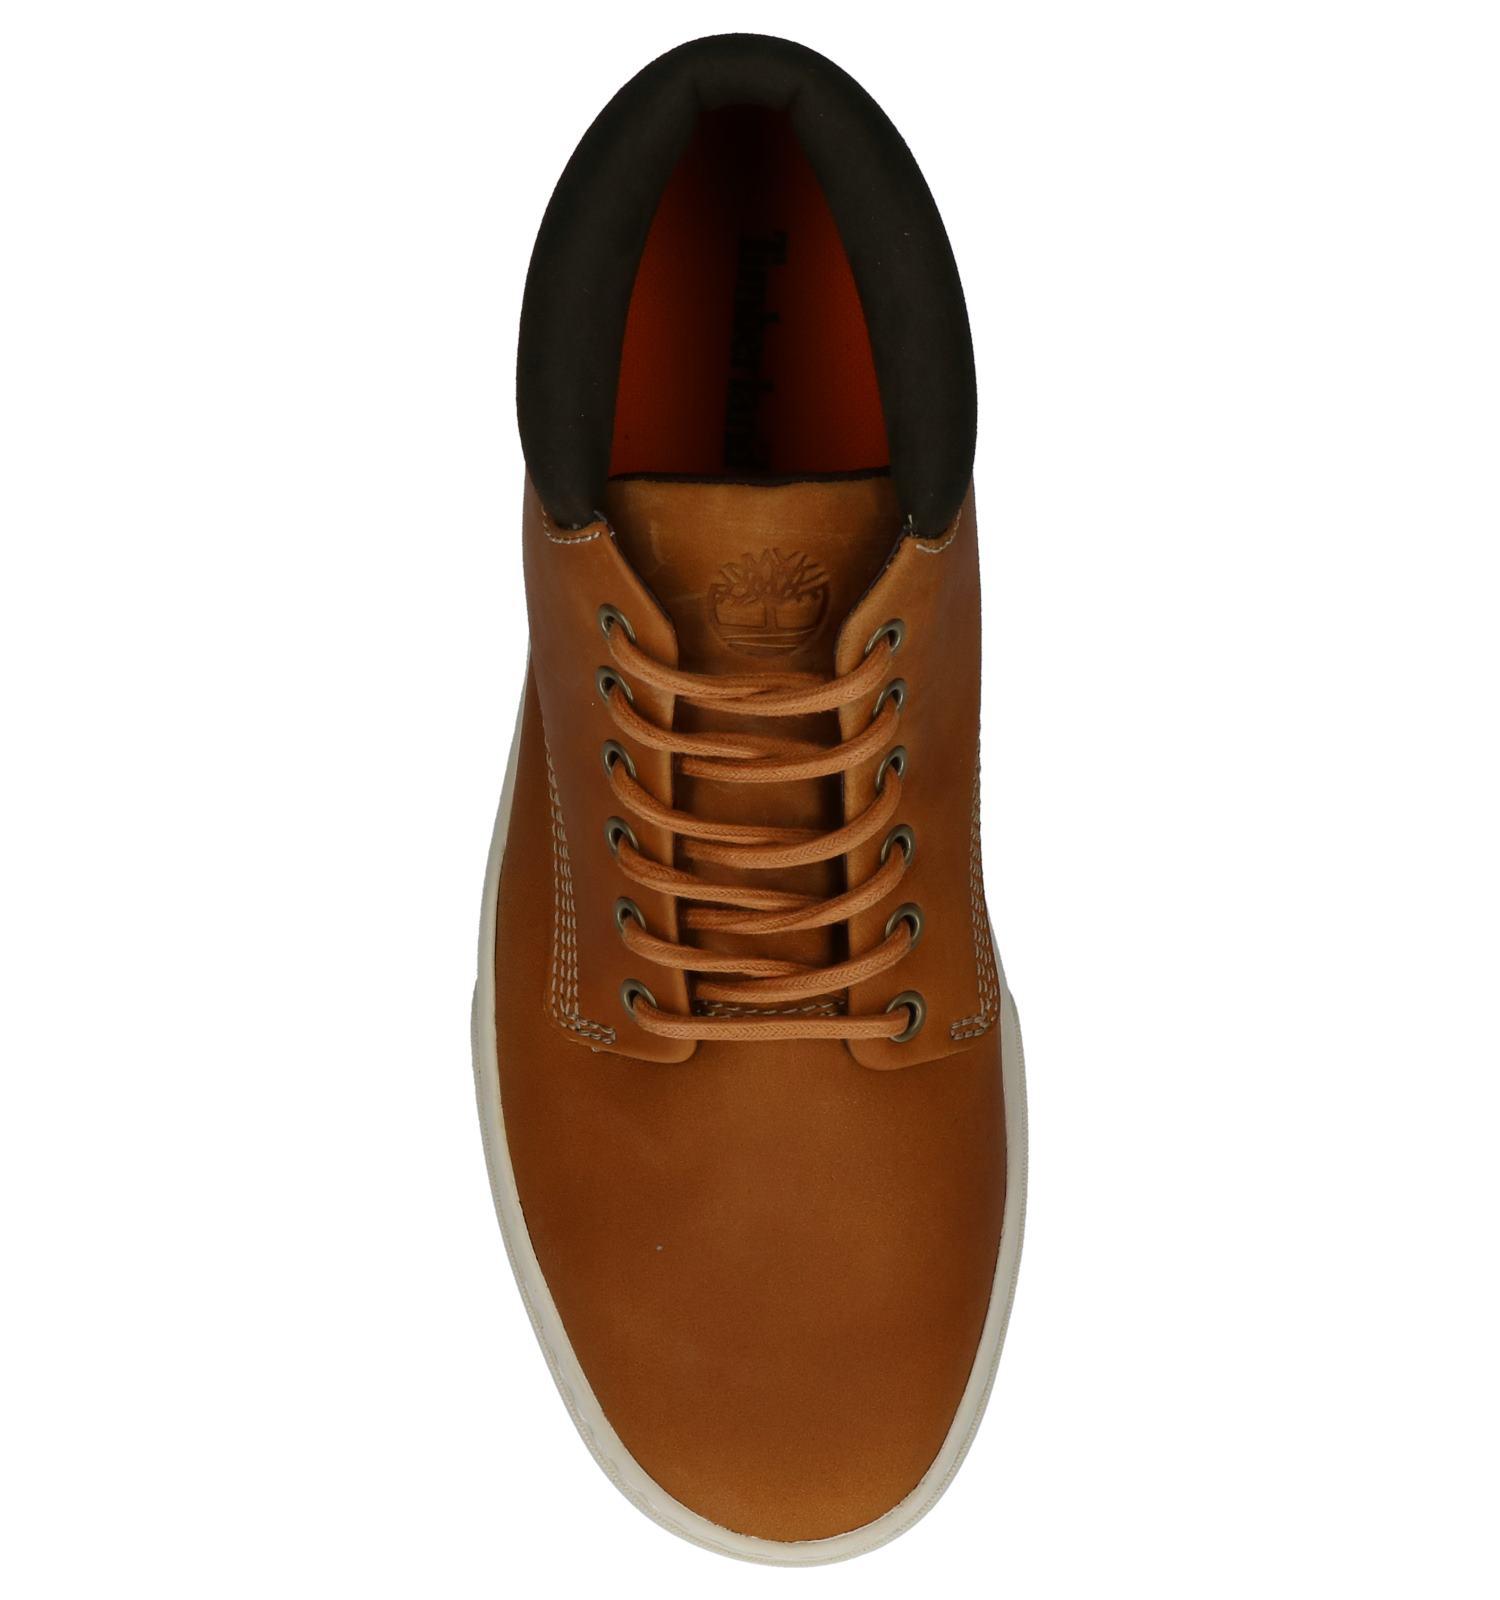 Timberland Adventure 2.0 Cupsole Chaussures hautes en Cognac